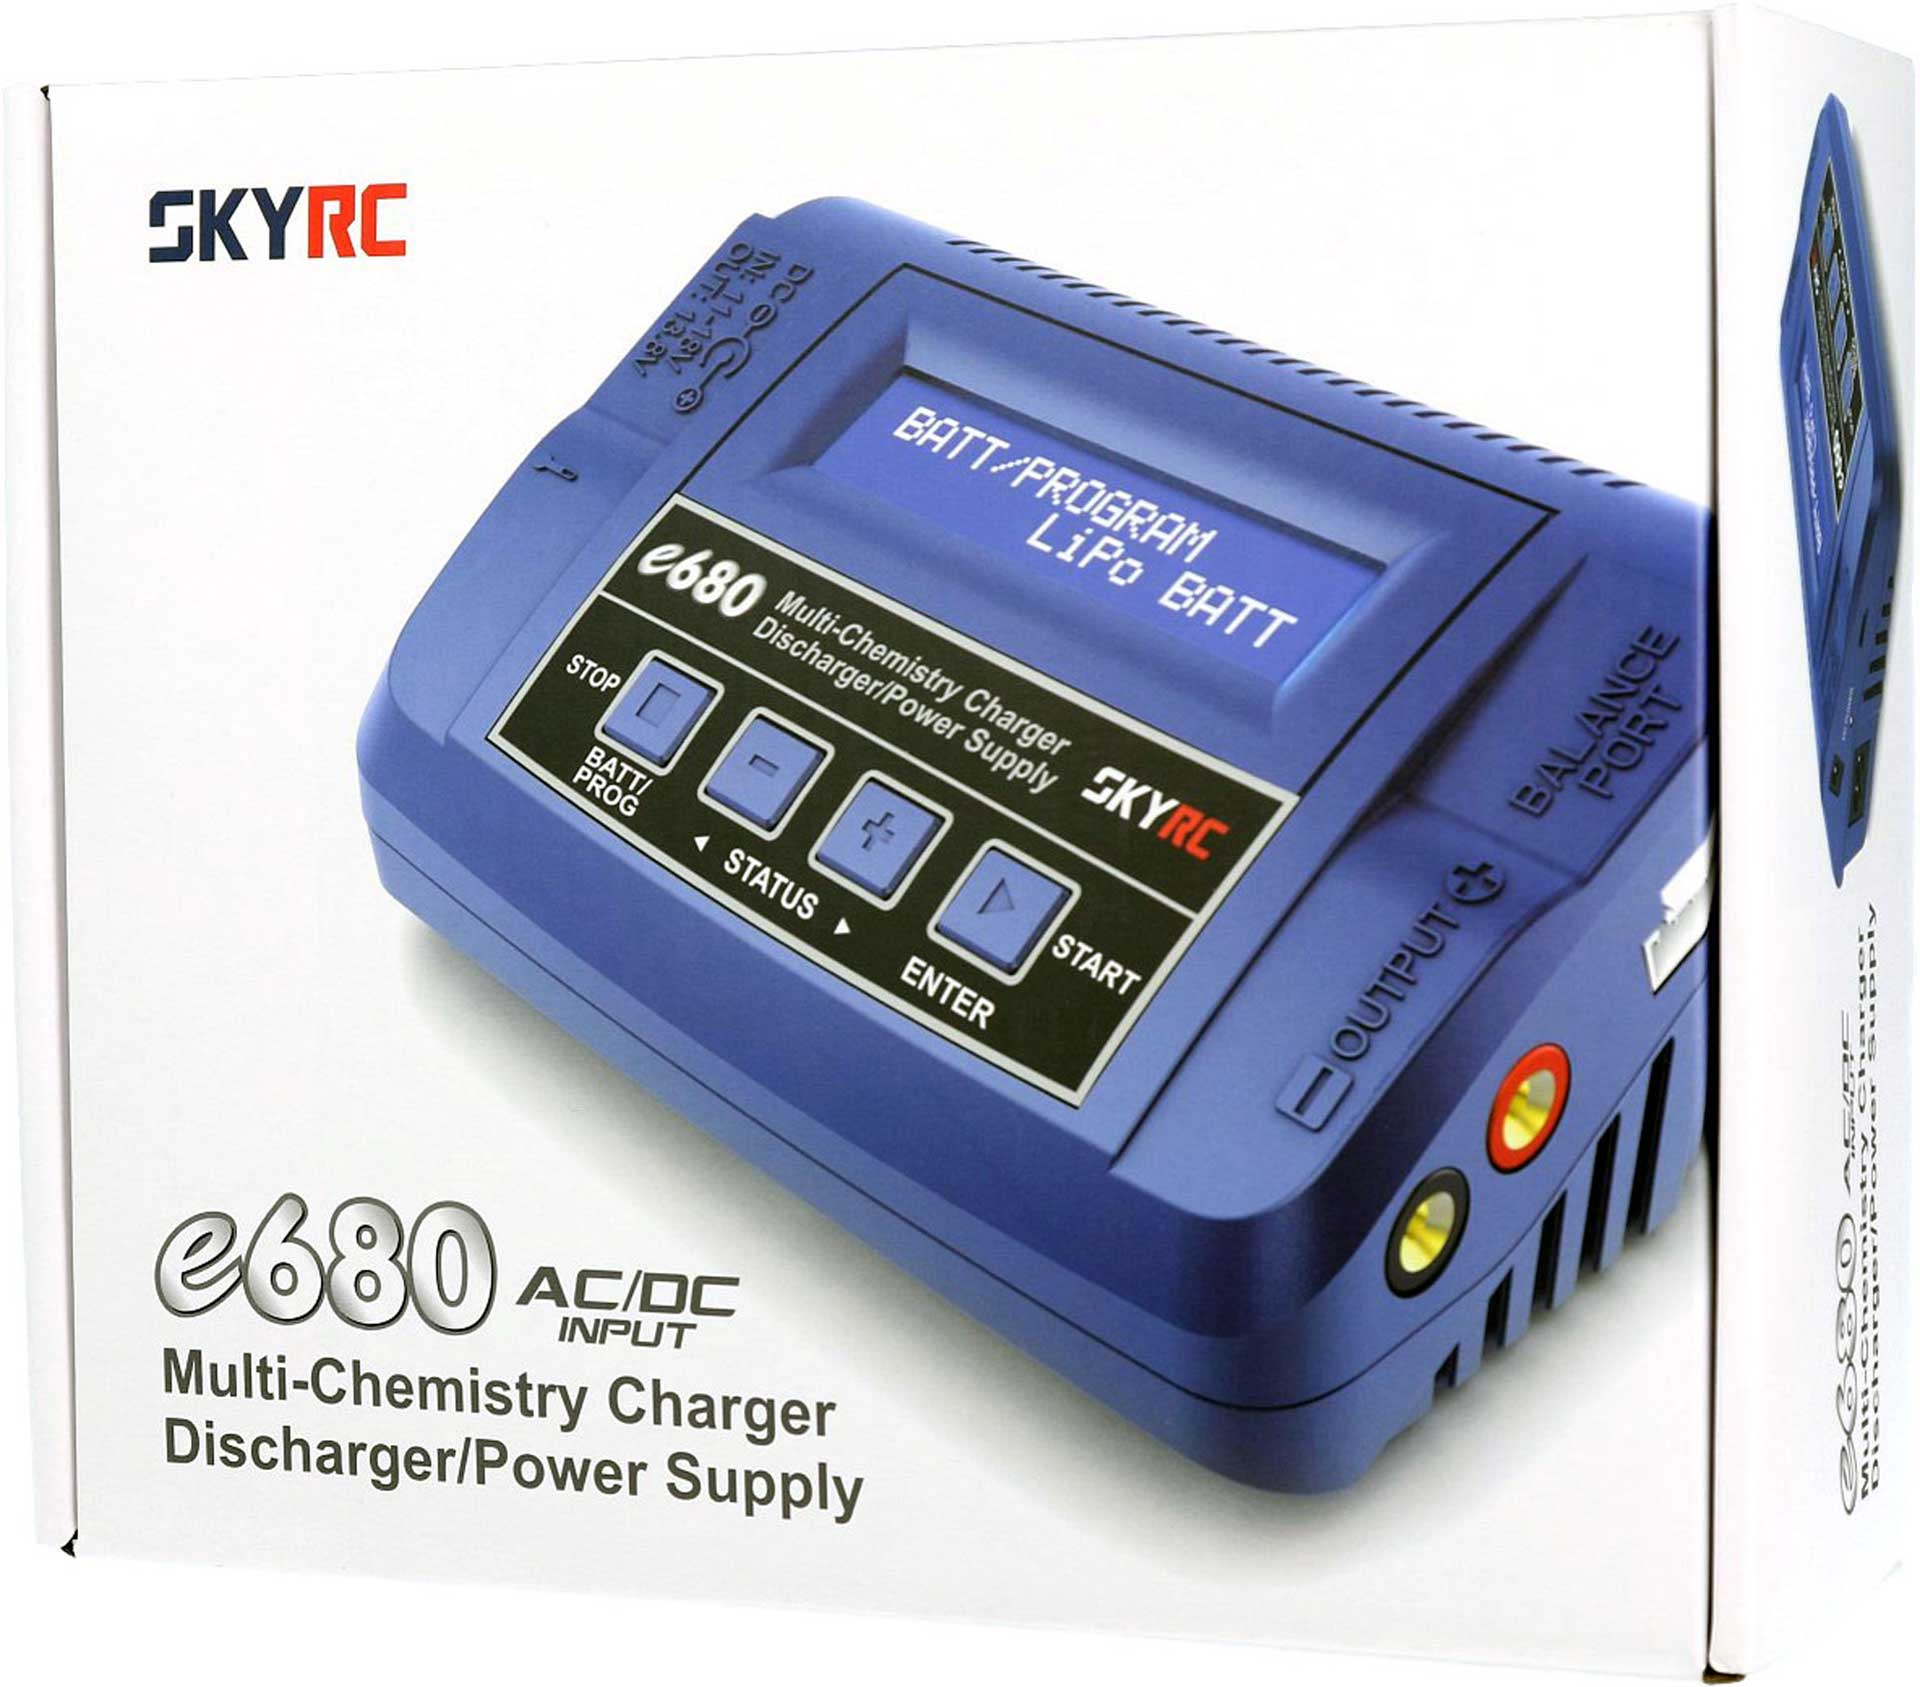 SKYRC E680 AC/DC CHARGER LIPO 1-6S 10A 80W